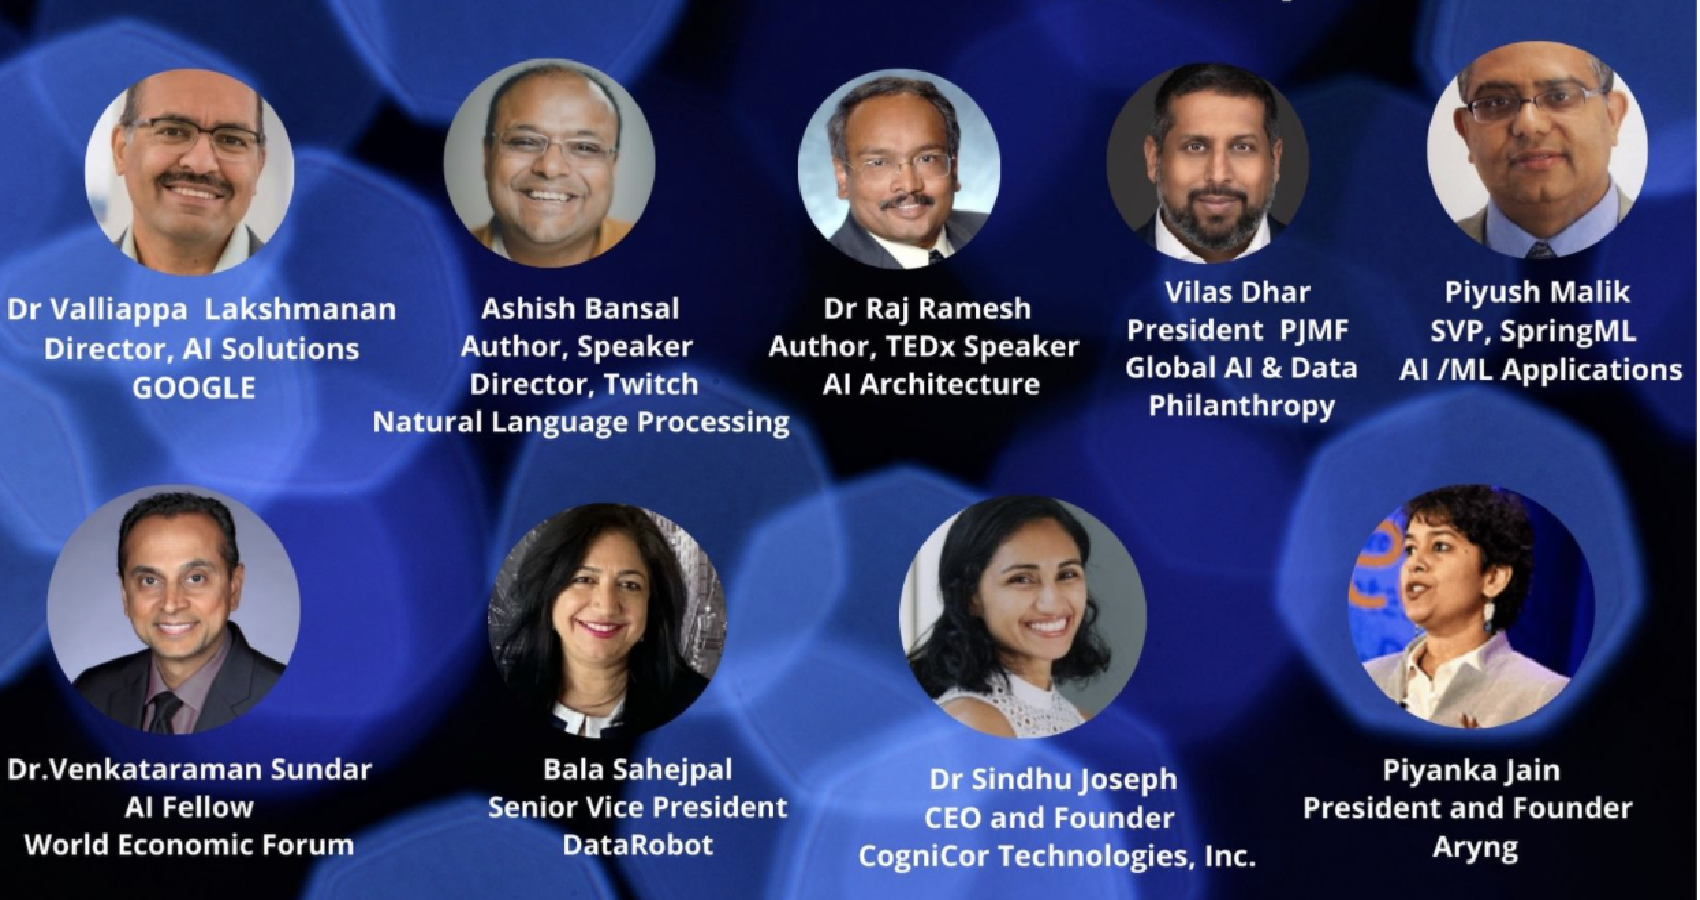 At ASEI's 2021 AI Summit, AI For Social Good, Data & Ethics Highlighted